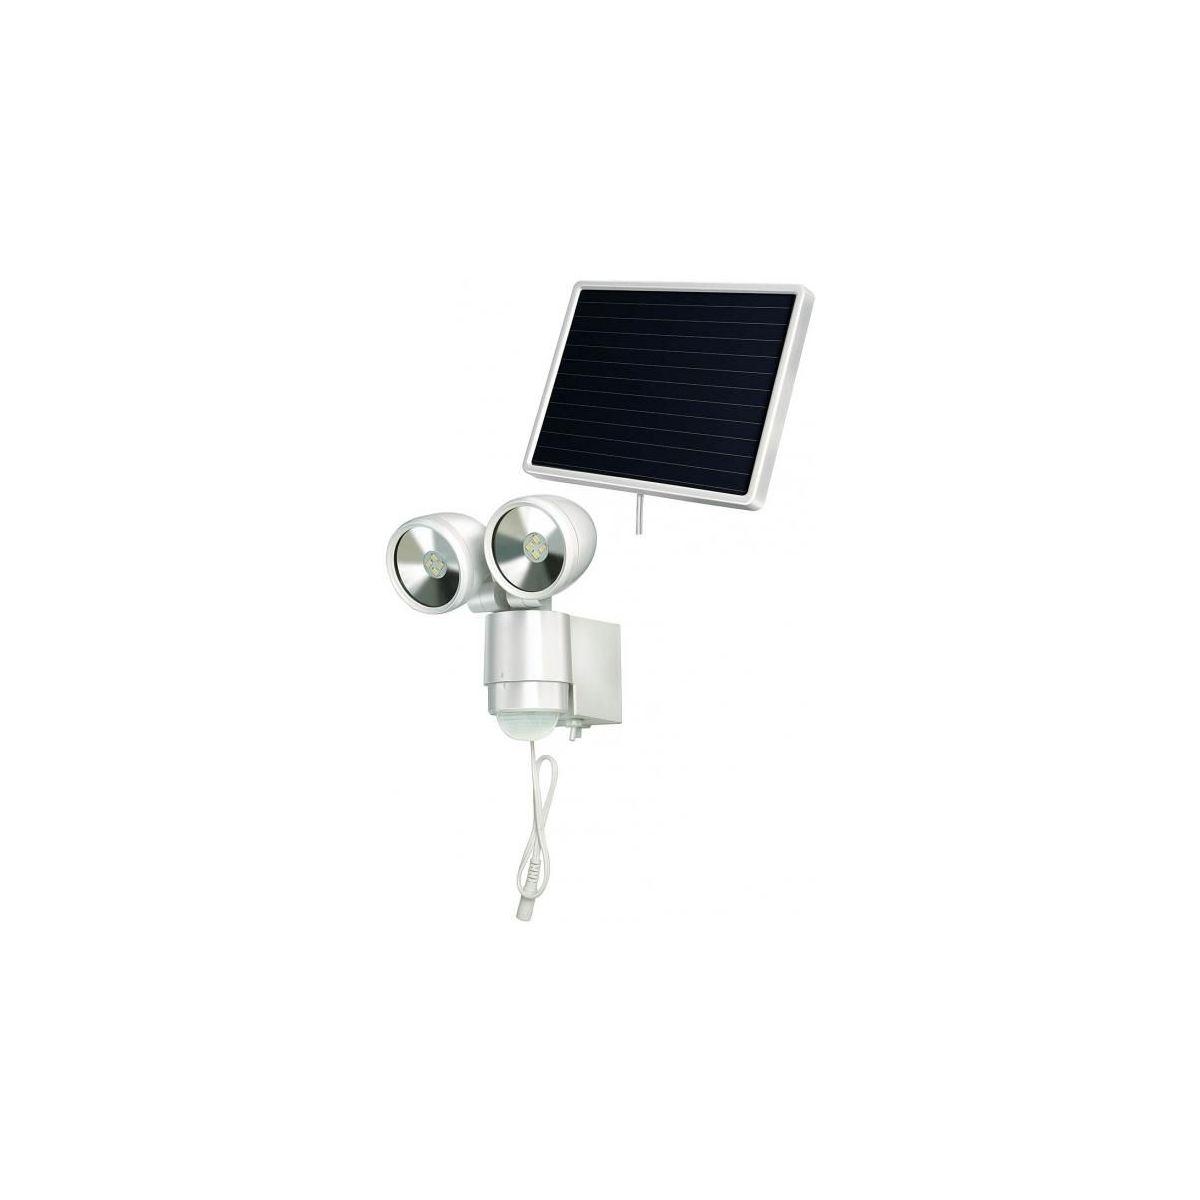 Brennenstuhl Outils Ip44 2x4 Lampe fr Noir Solaire Spot Led mOwv0N8n